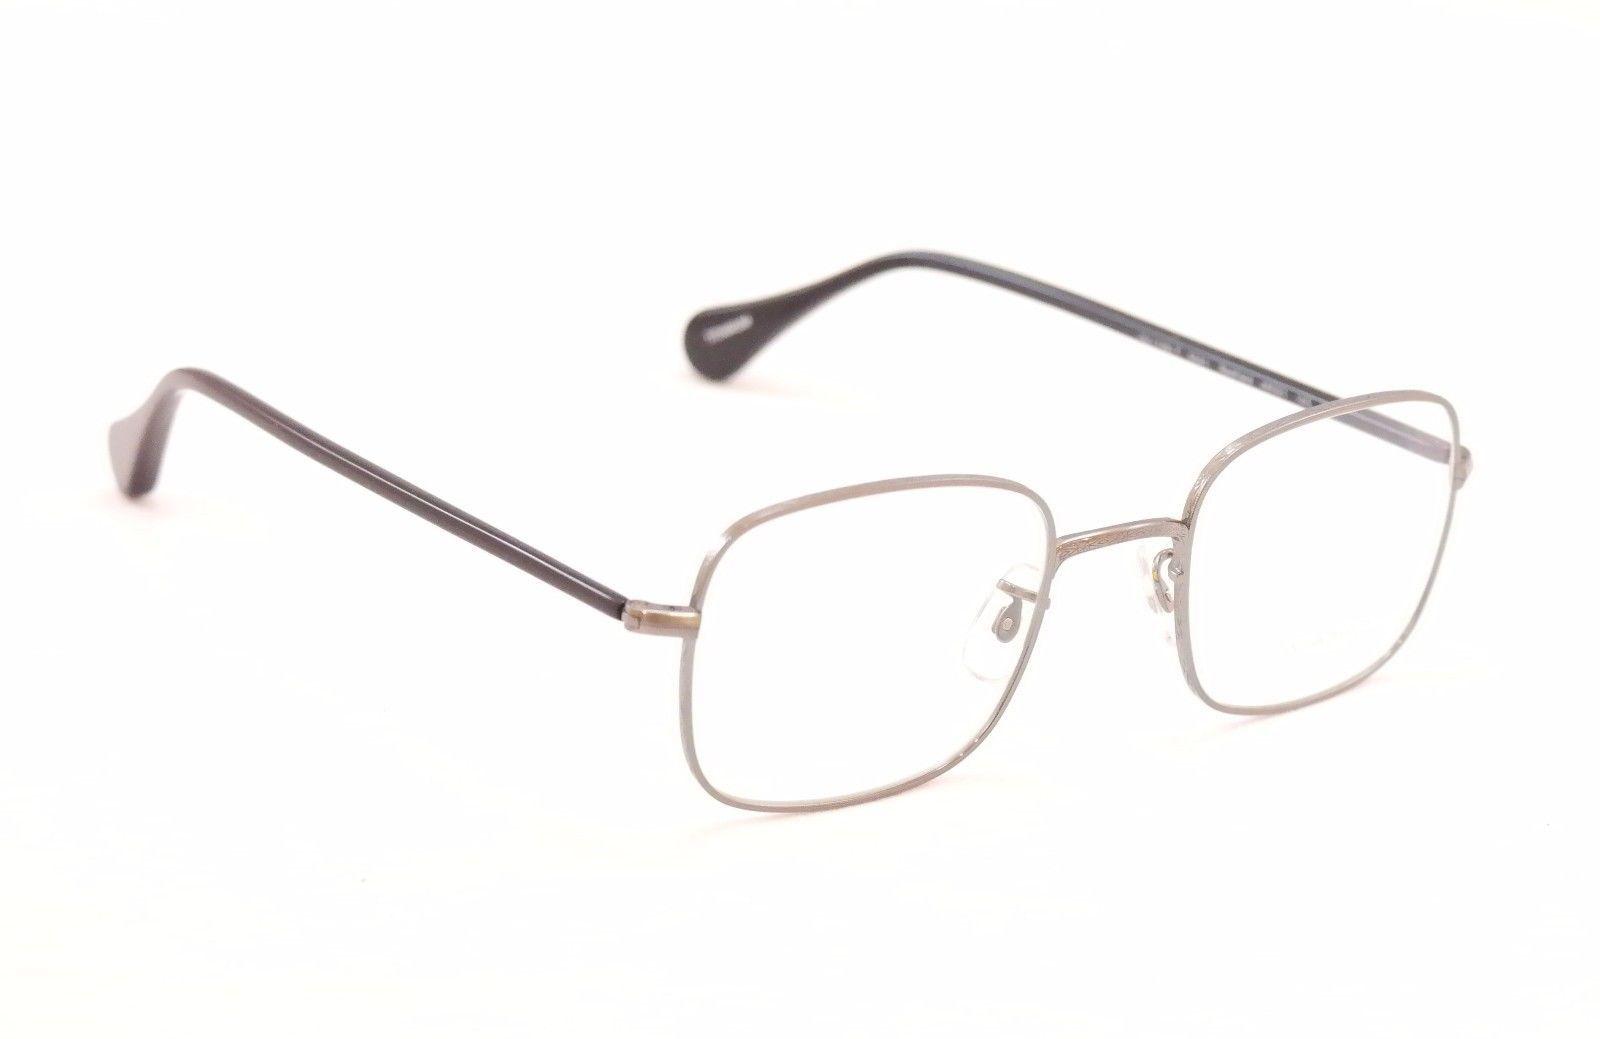 0d9509bb3ae Authentic Oliver Peoples Eyeglasses Titanium Frame OV1129T Redfield Pewter  Black